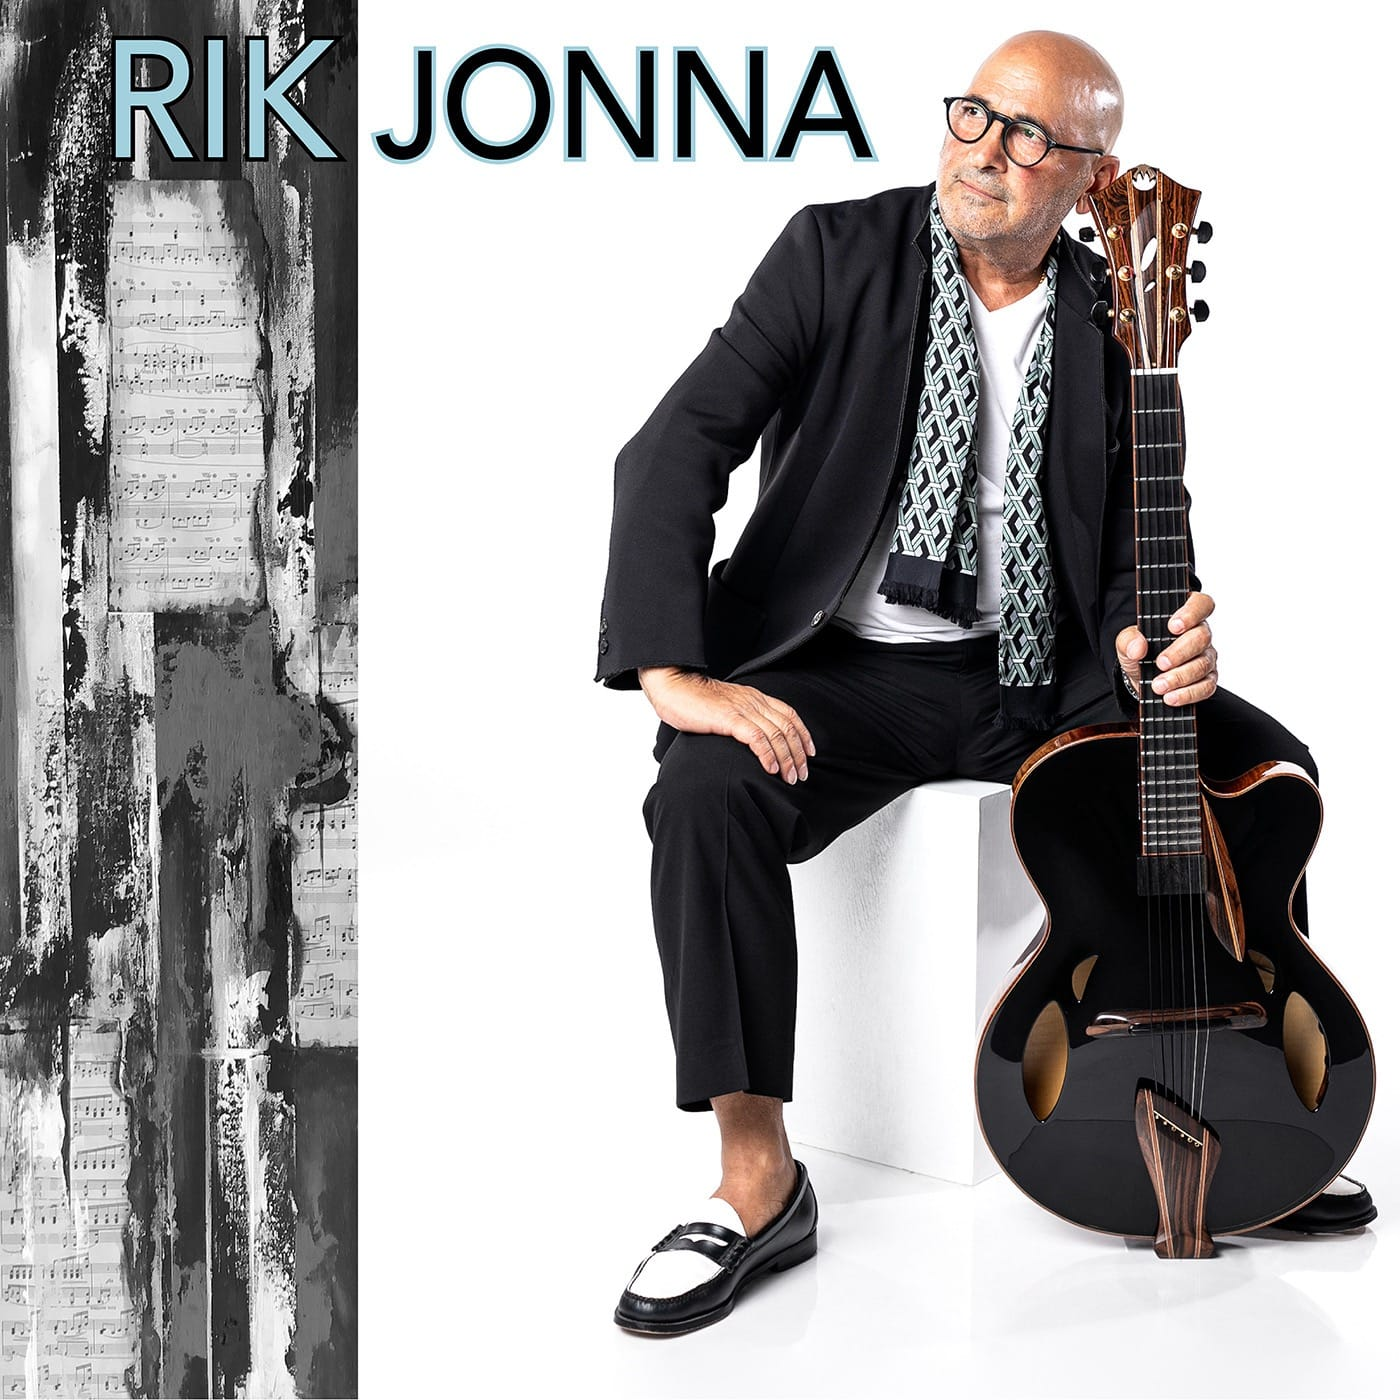 Rik Jonna Plays Mirabella Guitars